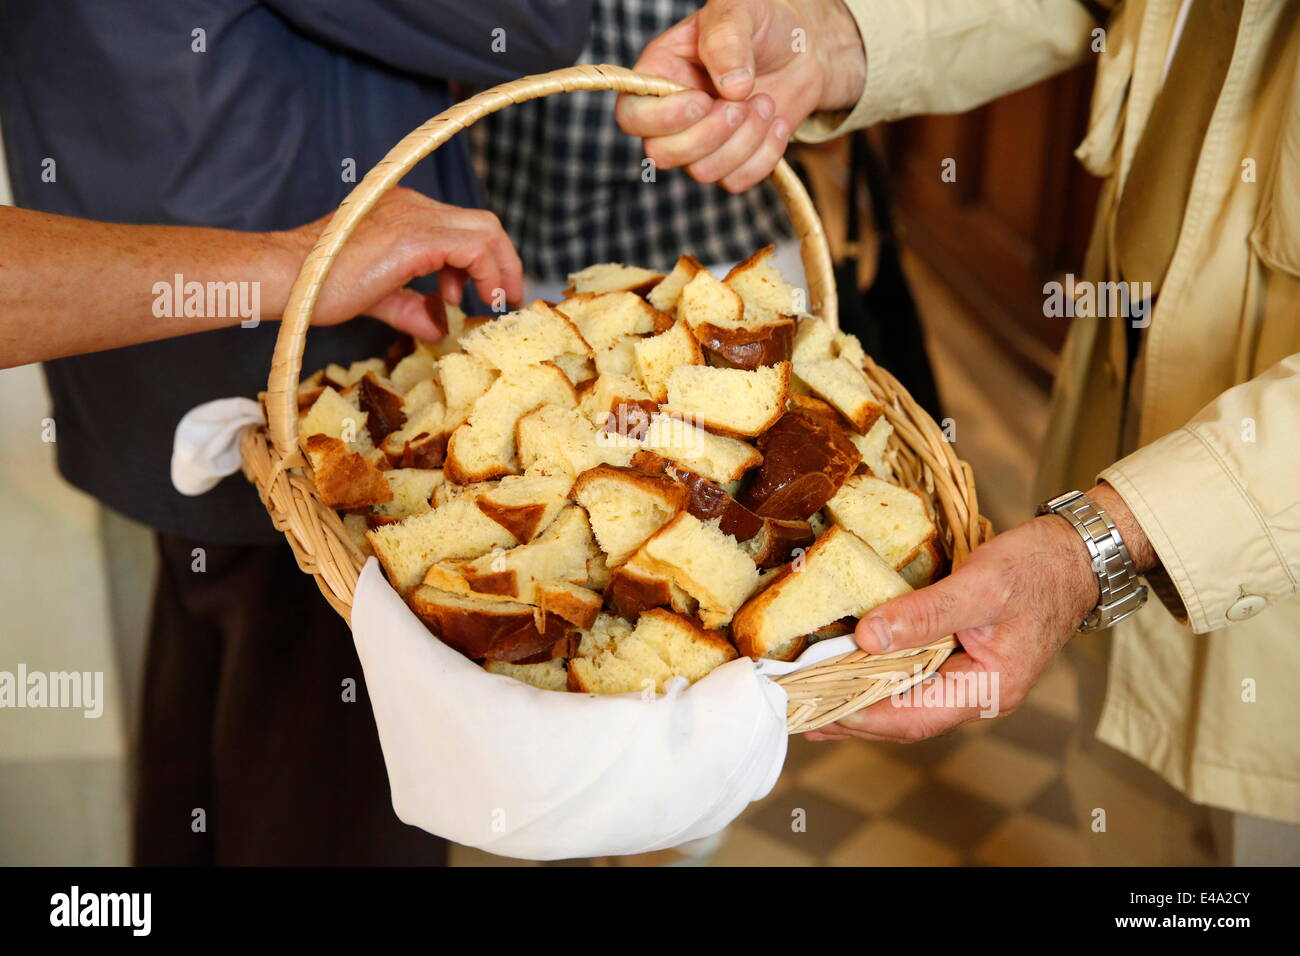 Distribution of blessed bread, St. Hubert's Mass, Notre Dame du Hamel, Eure, France, Europe - Stock Image